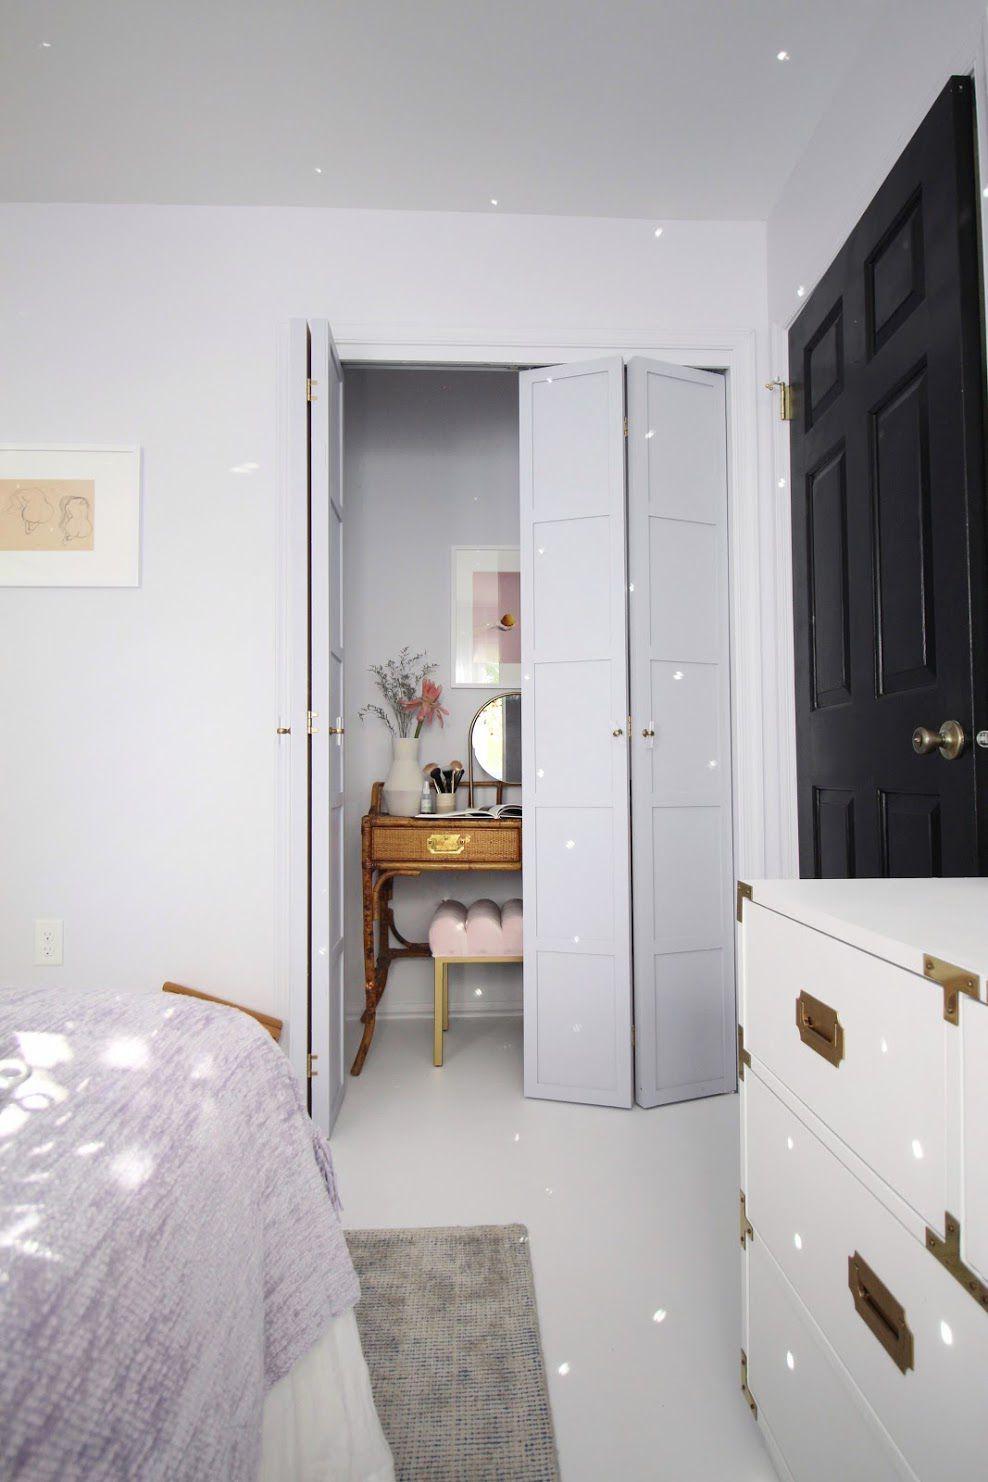 A bedroom with lavender walls and a lavender closet door